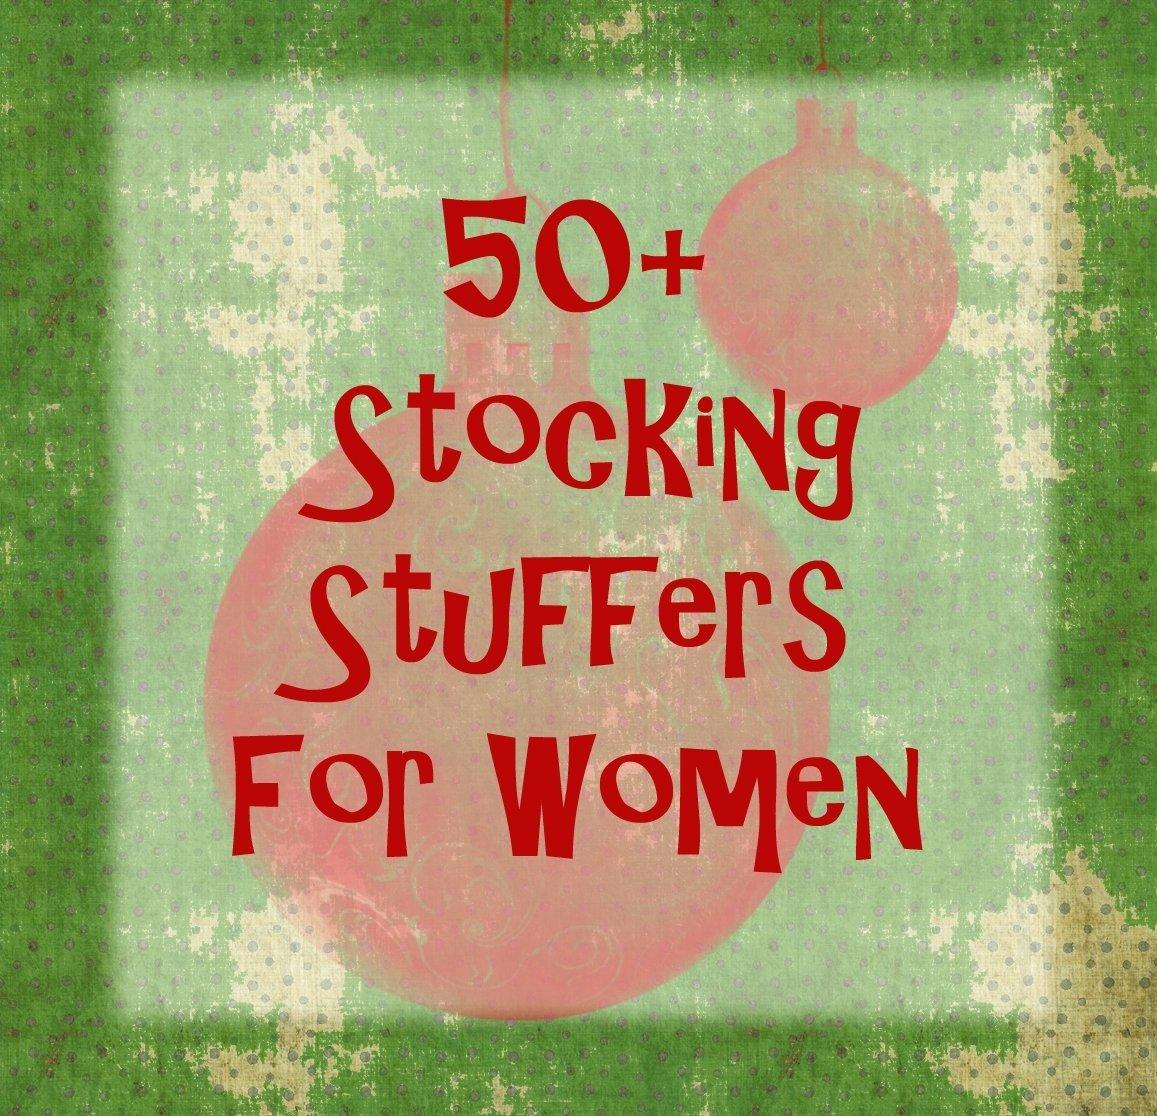 10 Amazing Stocking Stuffer Ideas For Wife 50 stocking stuffer ideas for women thelifeoflulubelle 1